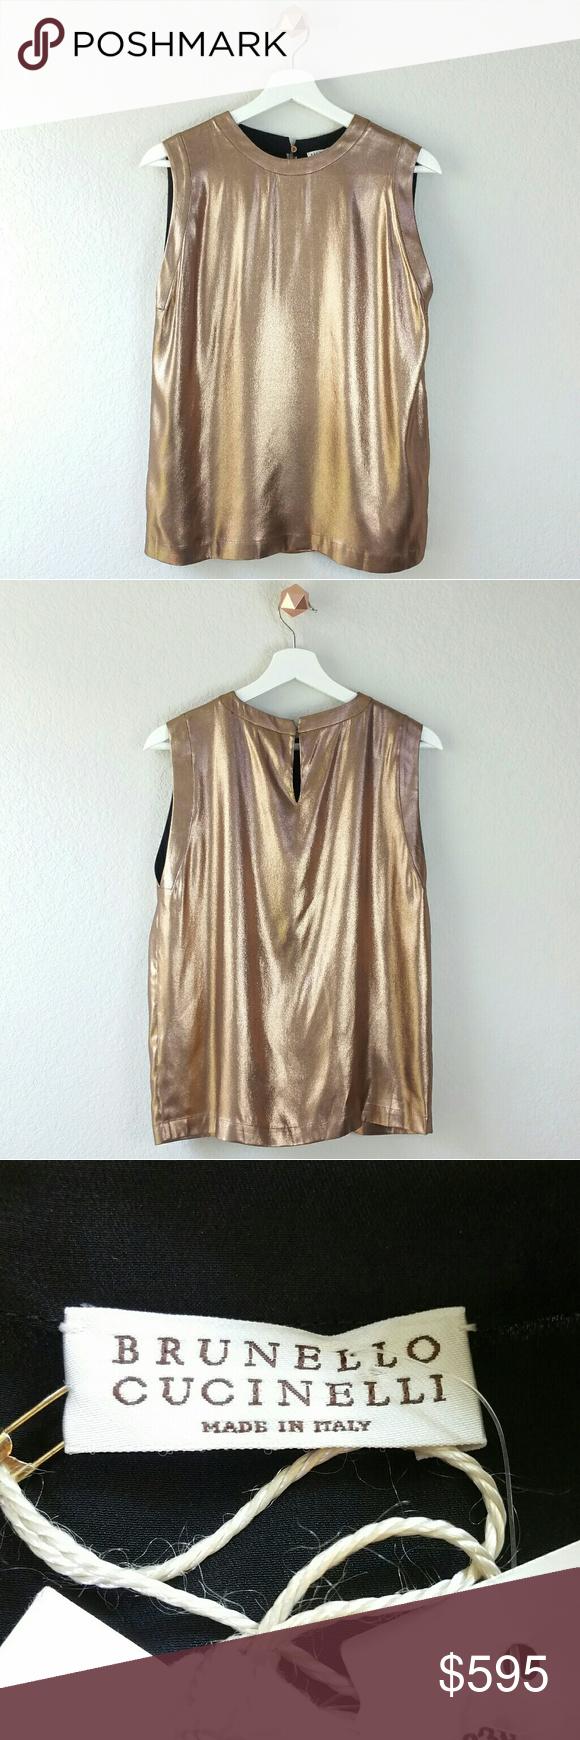 BRUNELLO CUCINELLI copper metallic blouse. Copper RoseRose GoldMetallic  BlousesGold FabricTop ... e7c3cc6a2